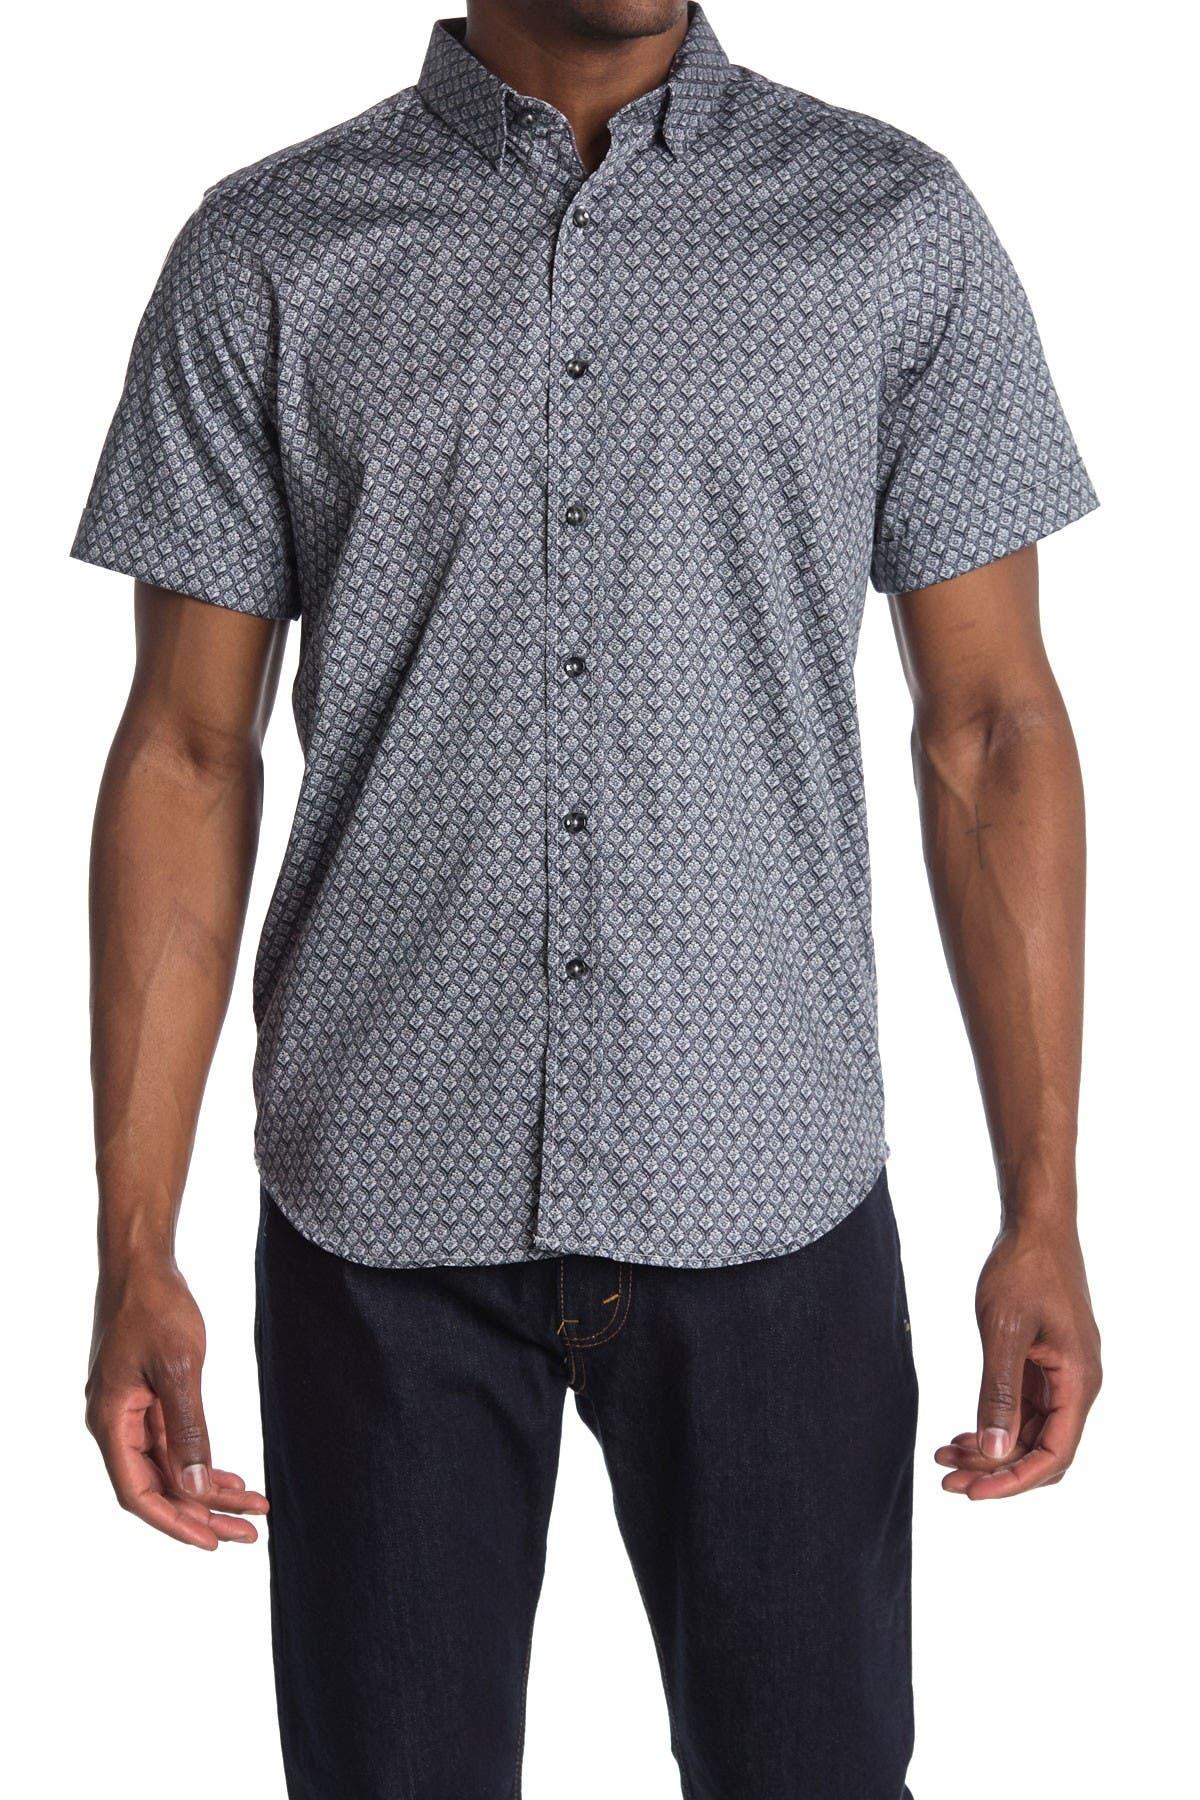 Image of Robert Graham Solano Printed Regular Fit Shirt